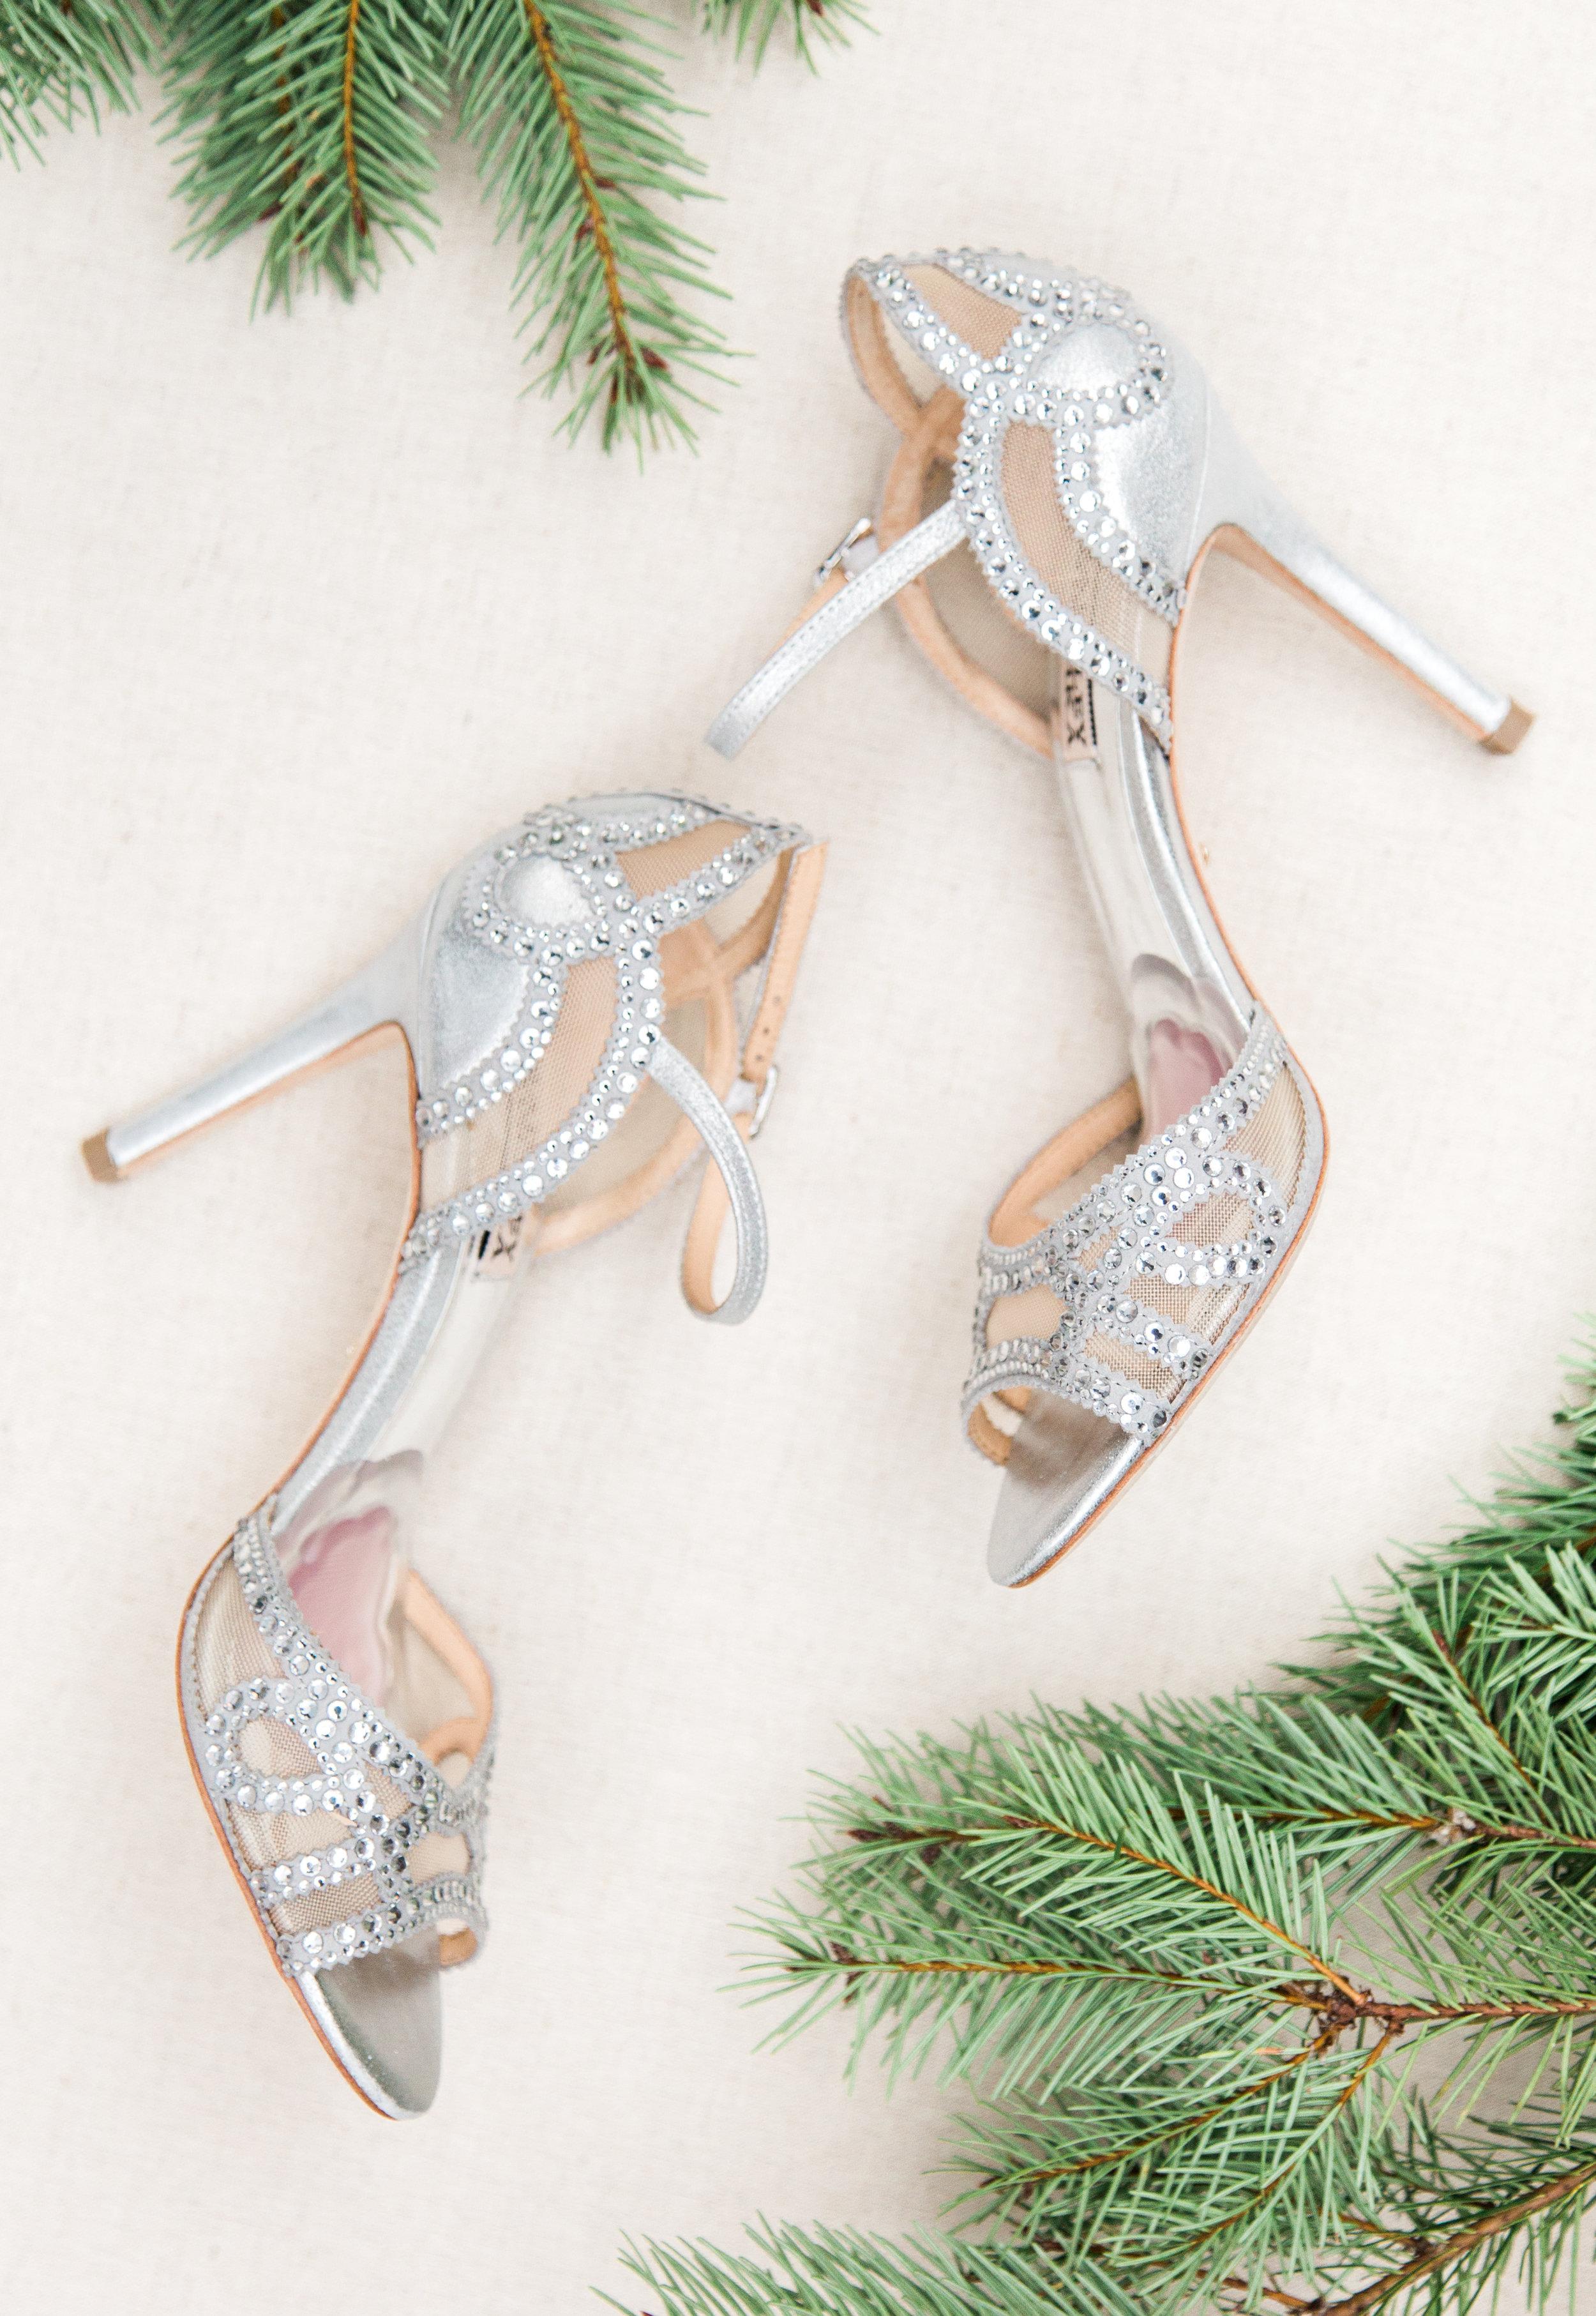 Hudson-Nichols-Martha-Stewart-Weddings-Winter-Ski-Philadelphia-Claire-Conner_019.jpg